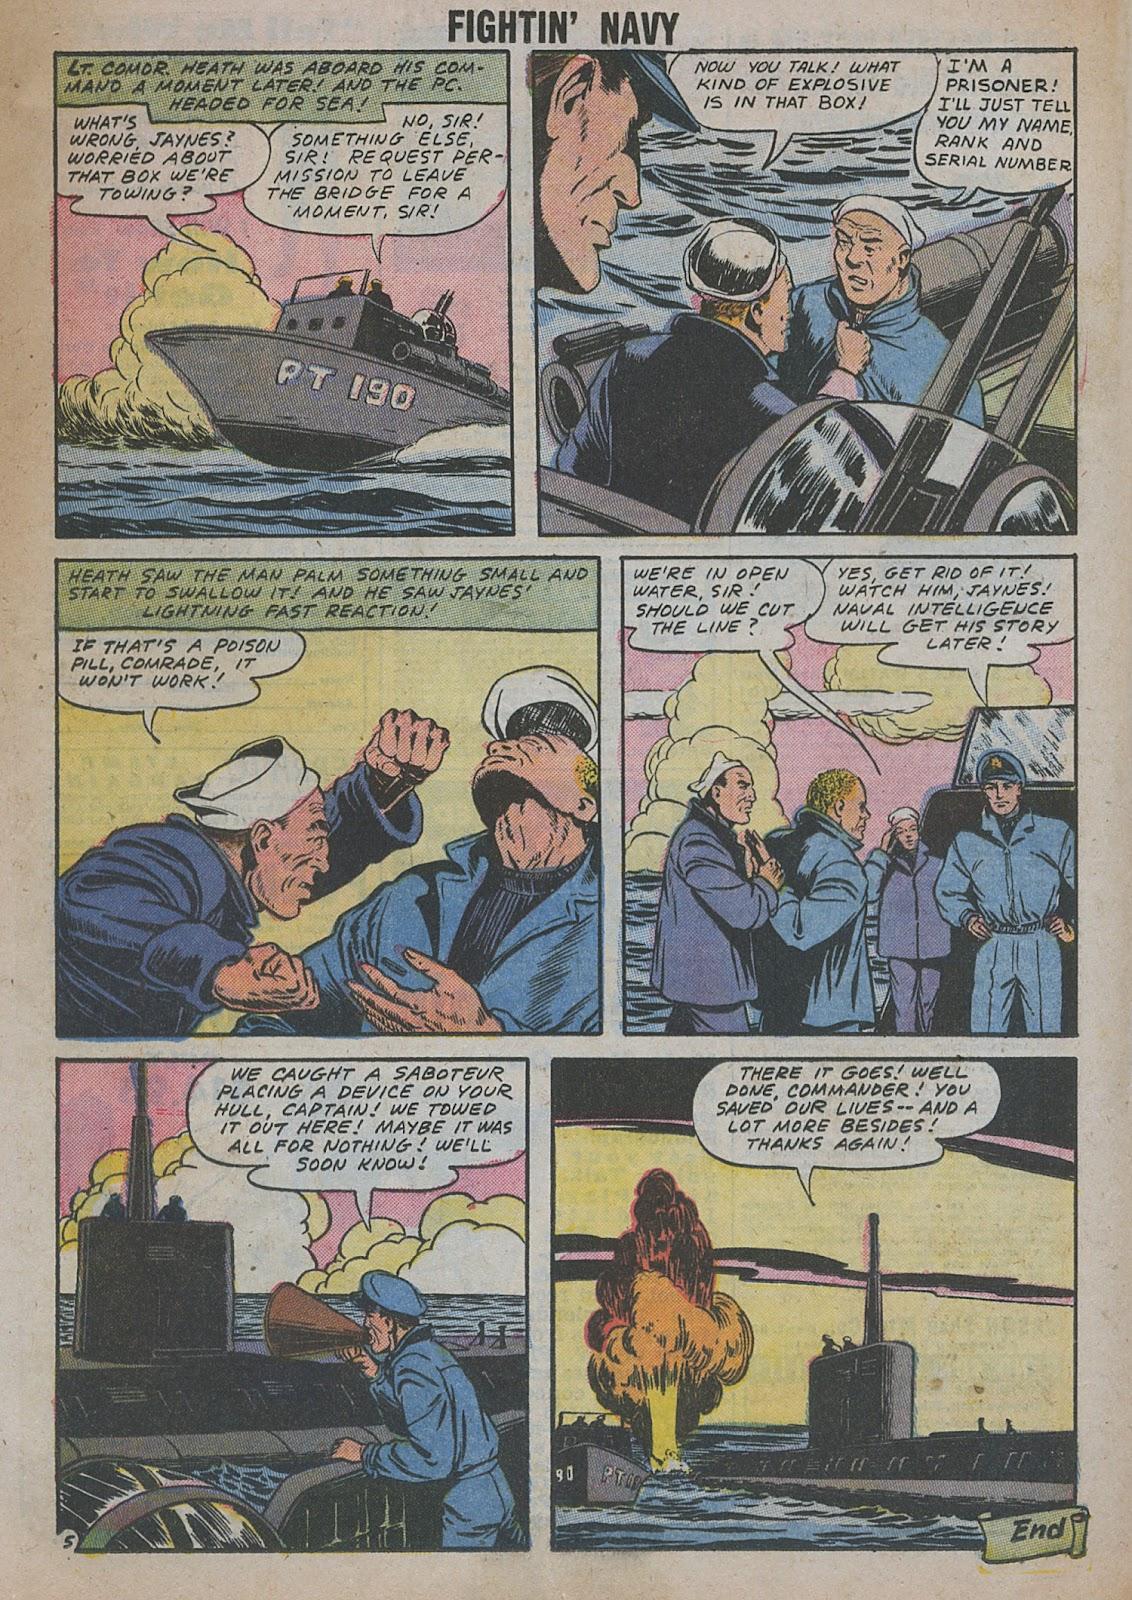 Read online Fightin' Navy comic -  Issue #82 - 47